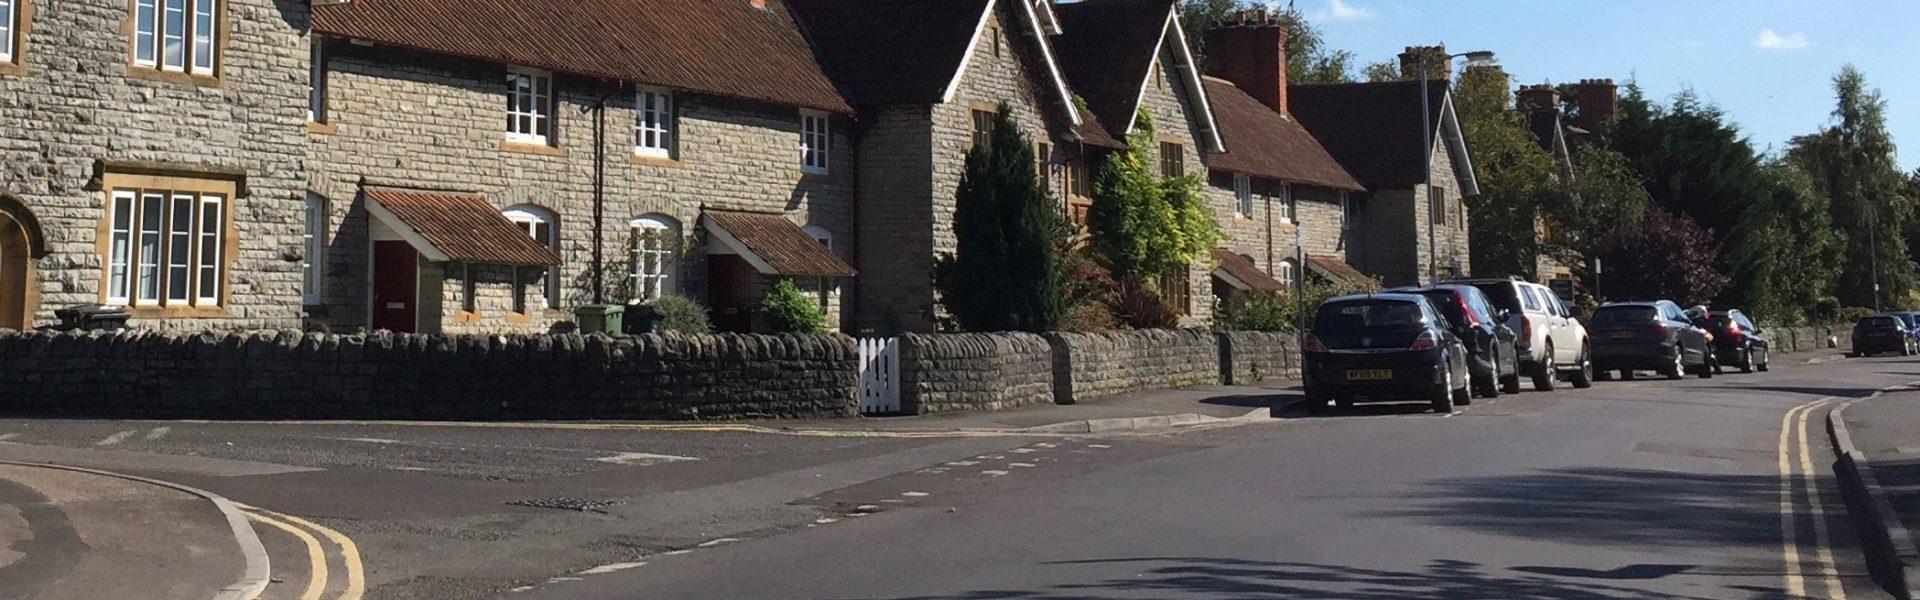 Wilfred Road in Street